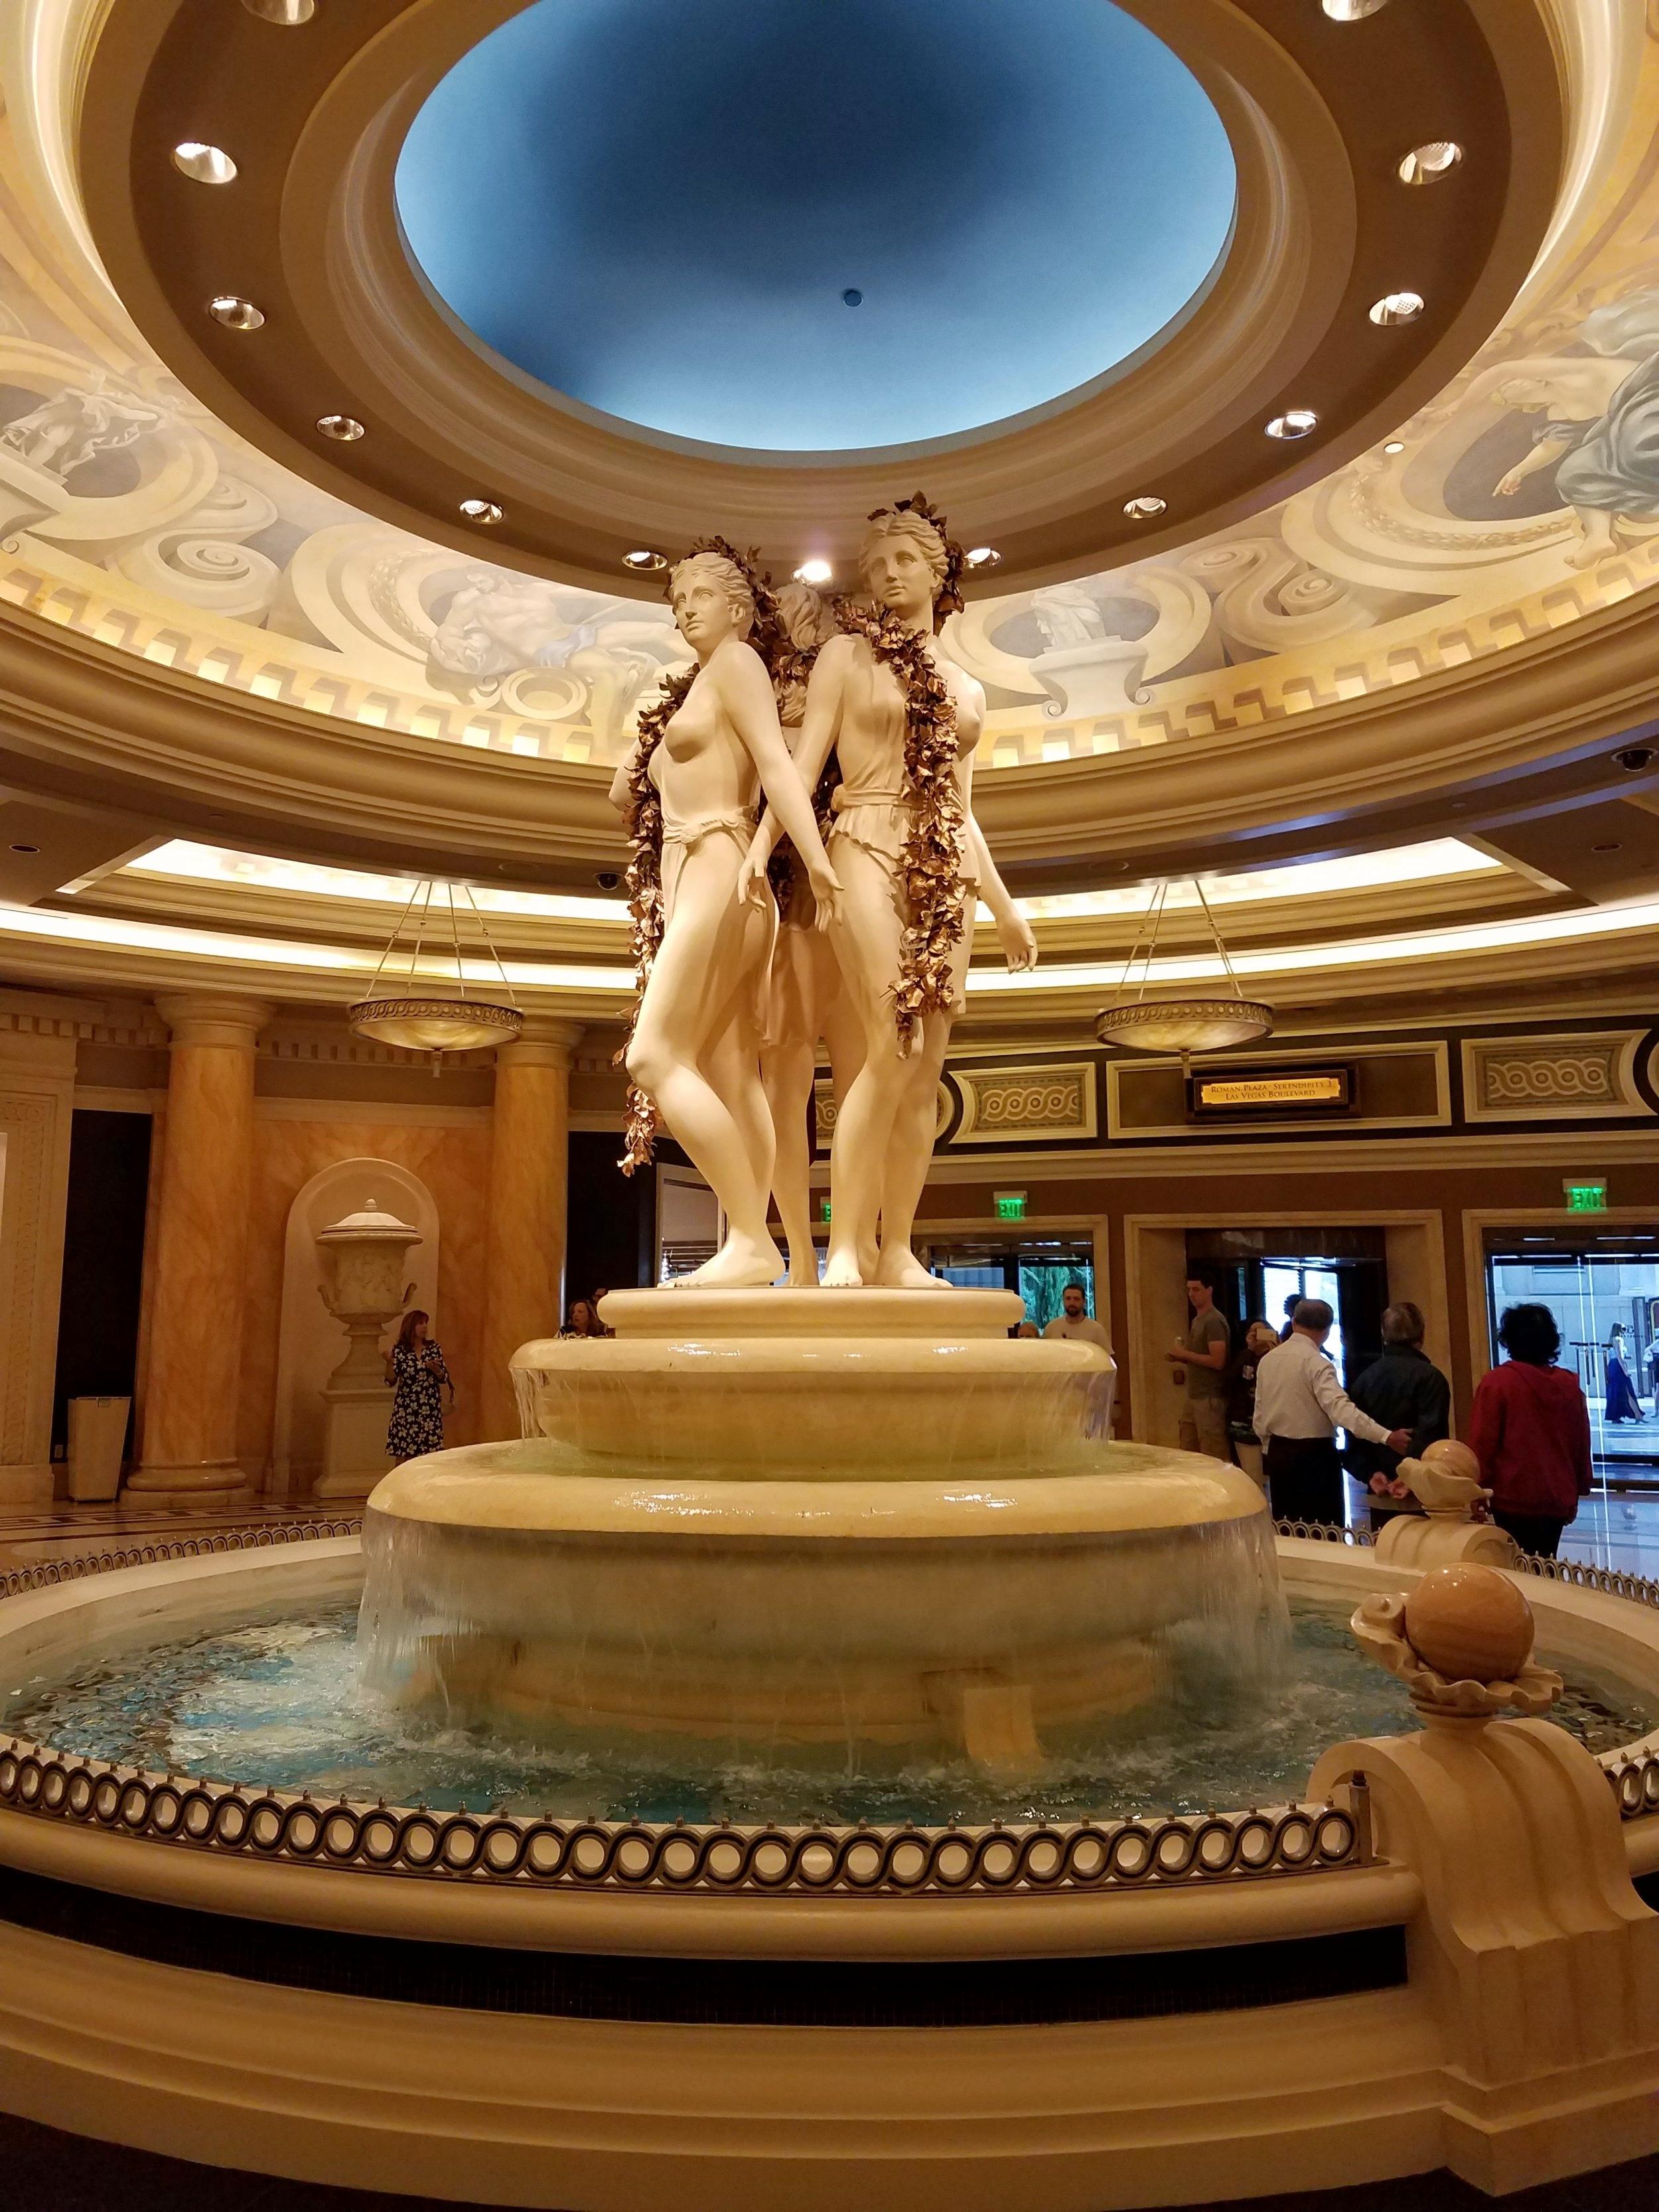 caesars palace statute